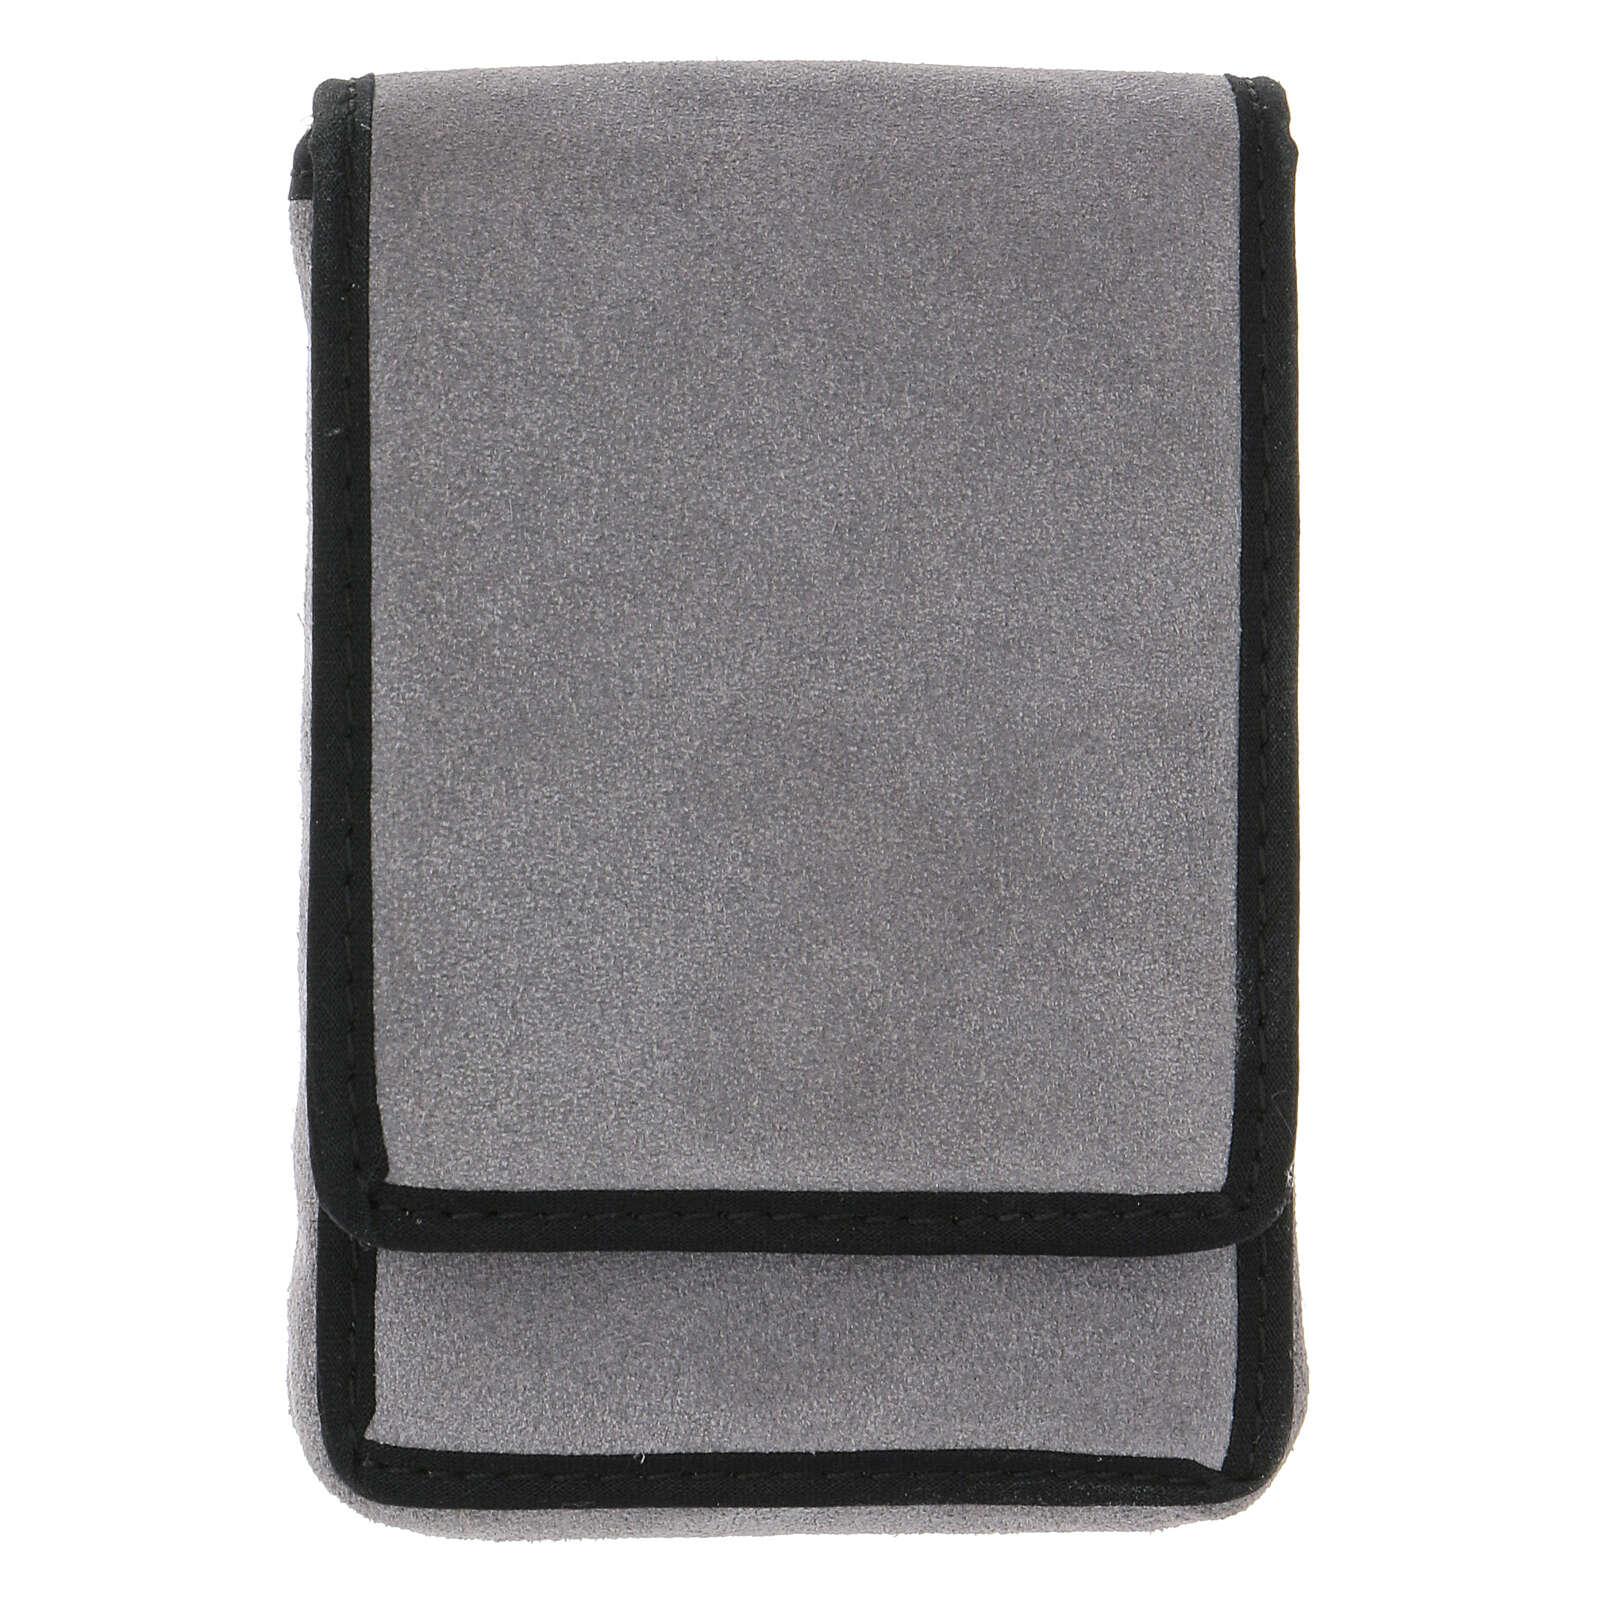 Sick call set chamois leatherette case 3